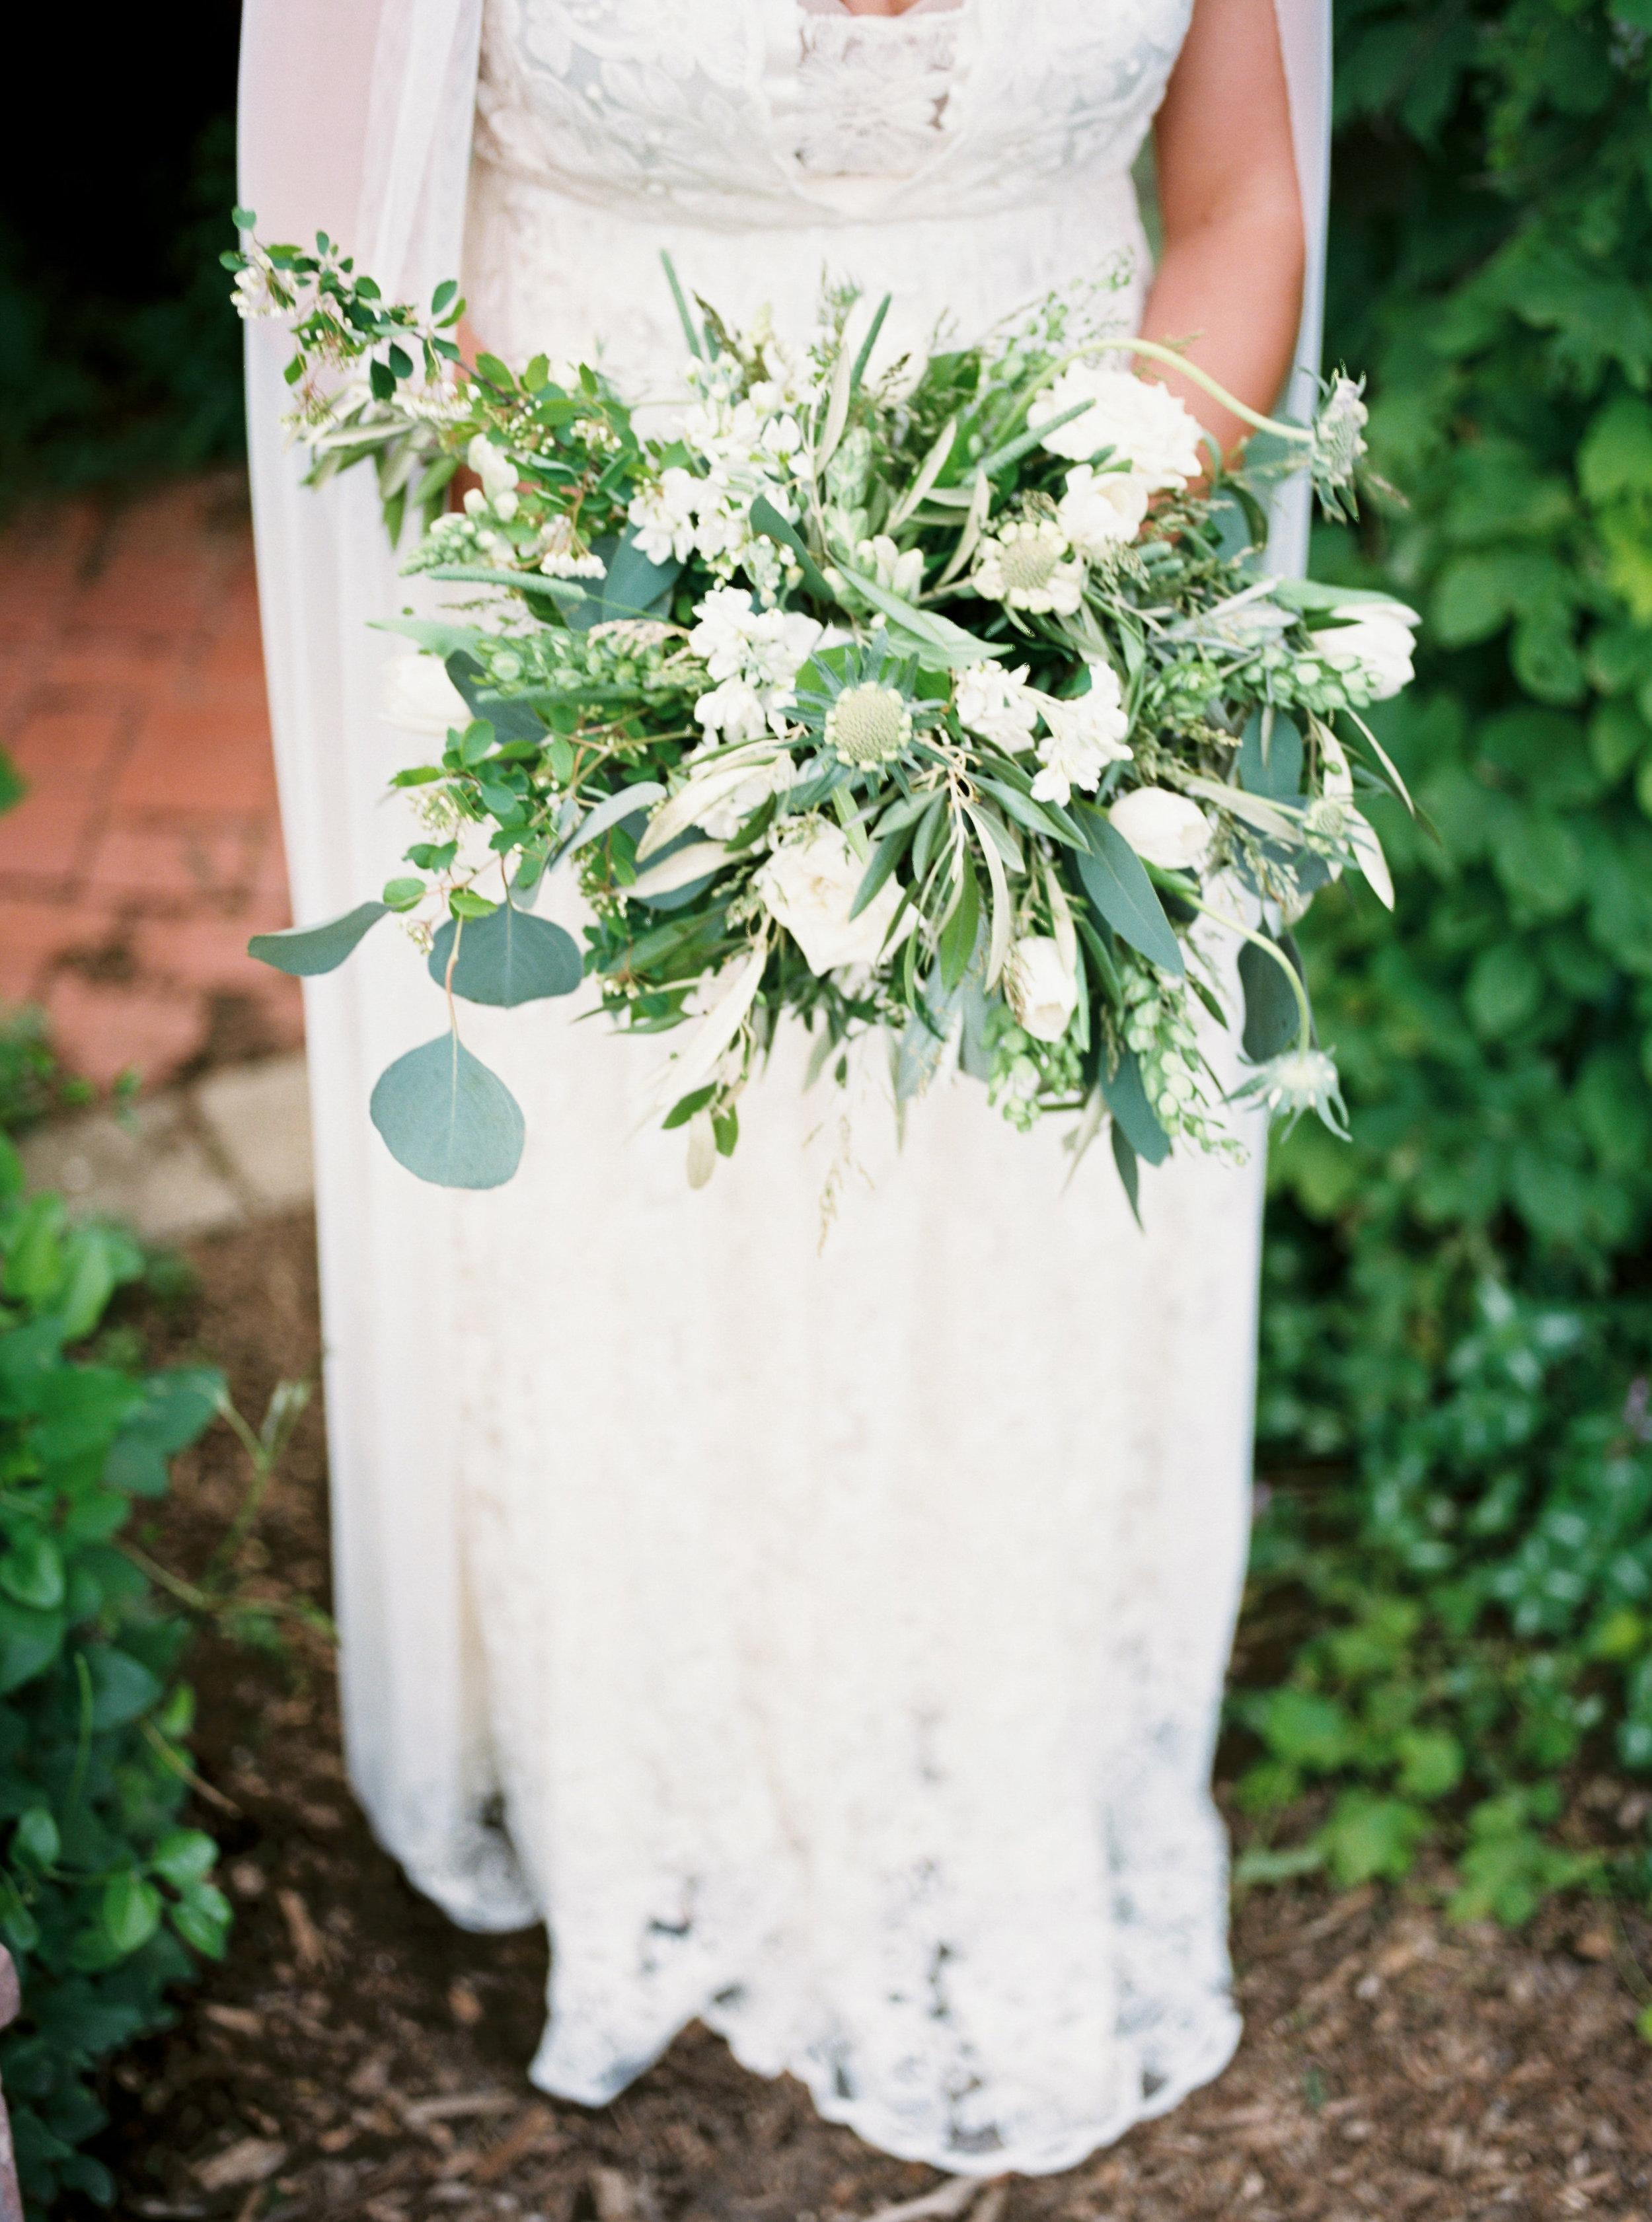 greenhouse-wedding-inspiration-by-laurelyn-savannah-photography-134.jpg